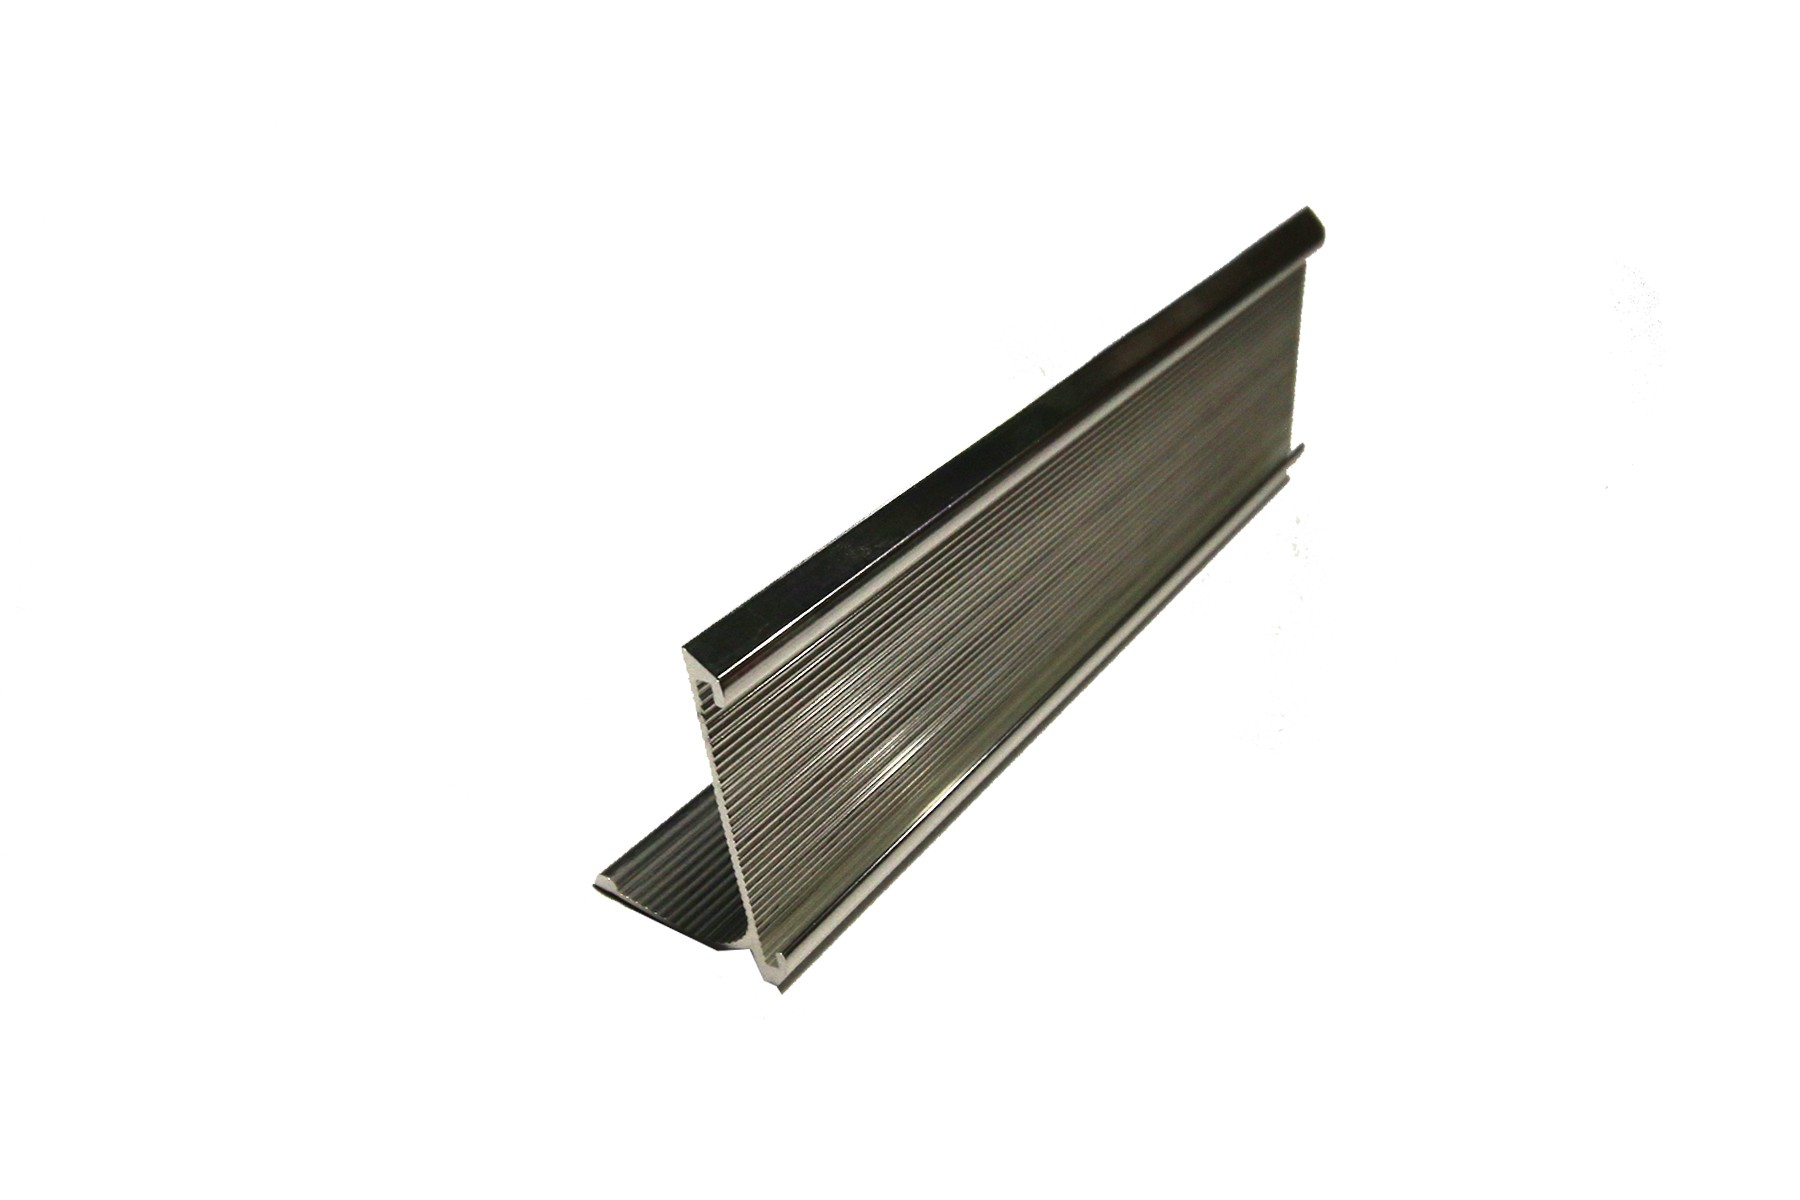 2 x 10 Ribbed Desk Holder, Silver